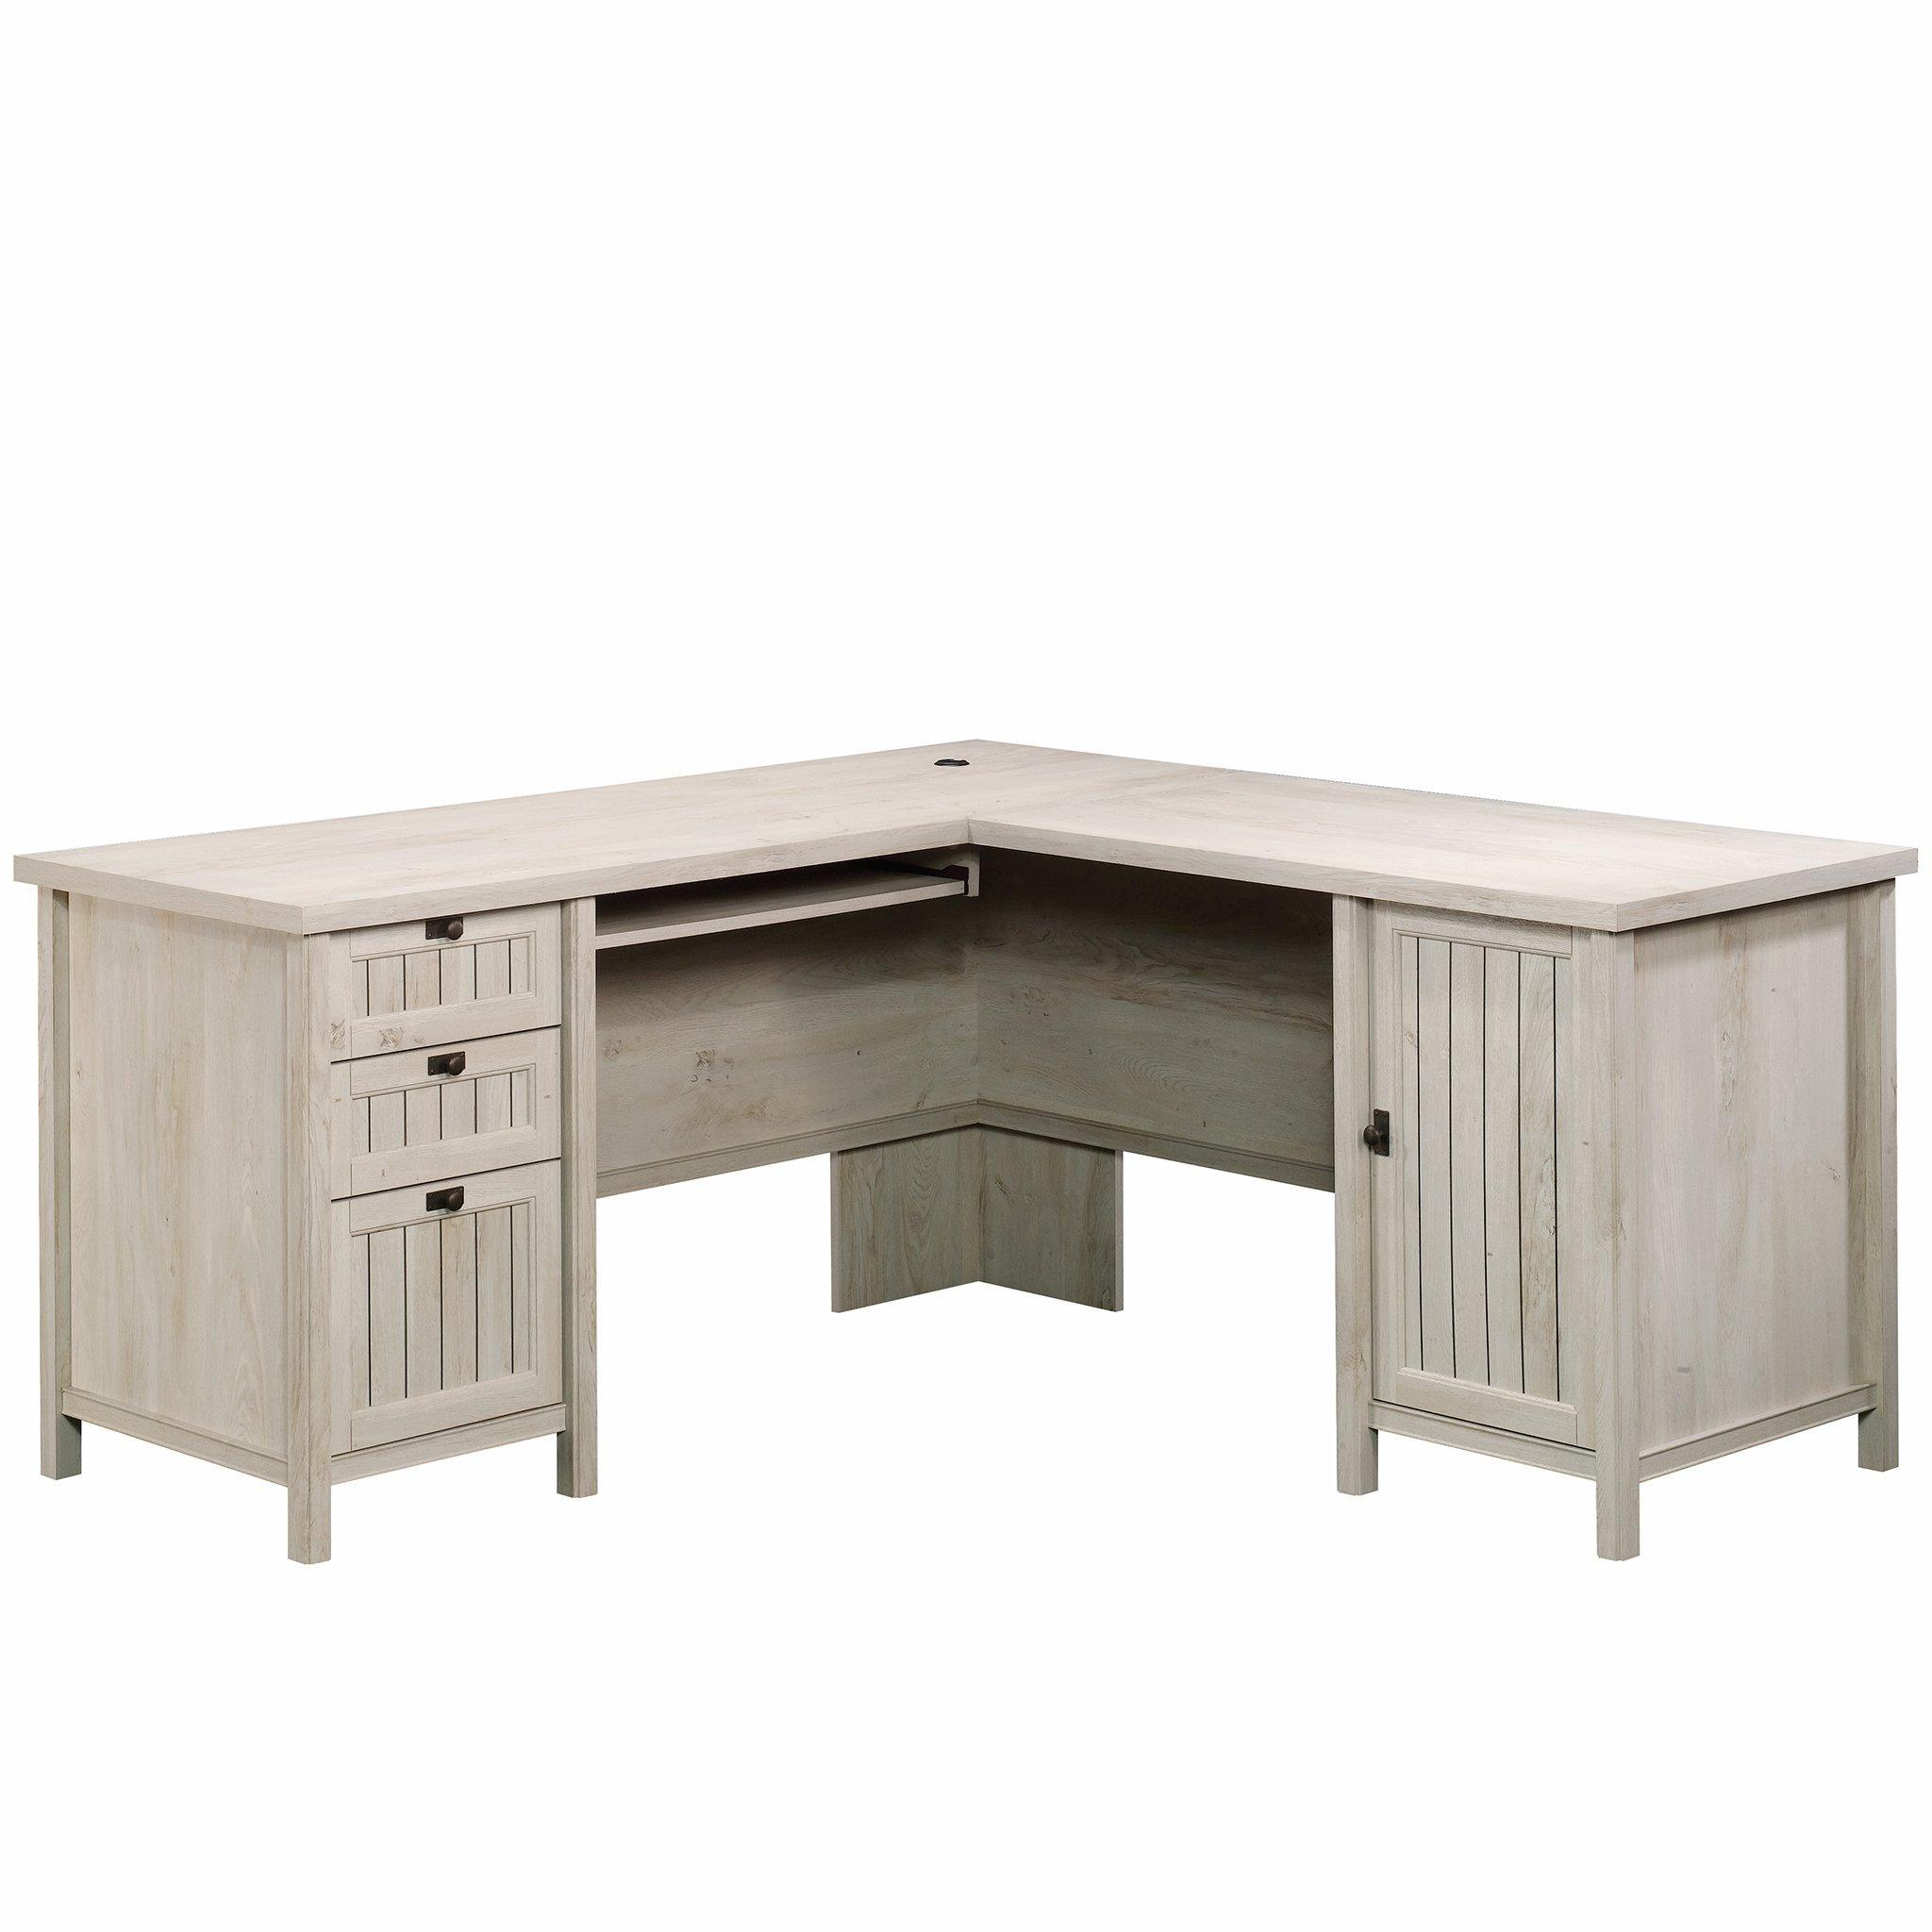 Sauder 419956 Costa L-Desk, Chalked Chestnut Finish